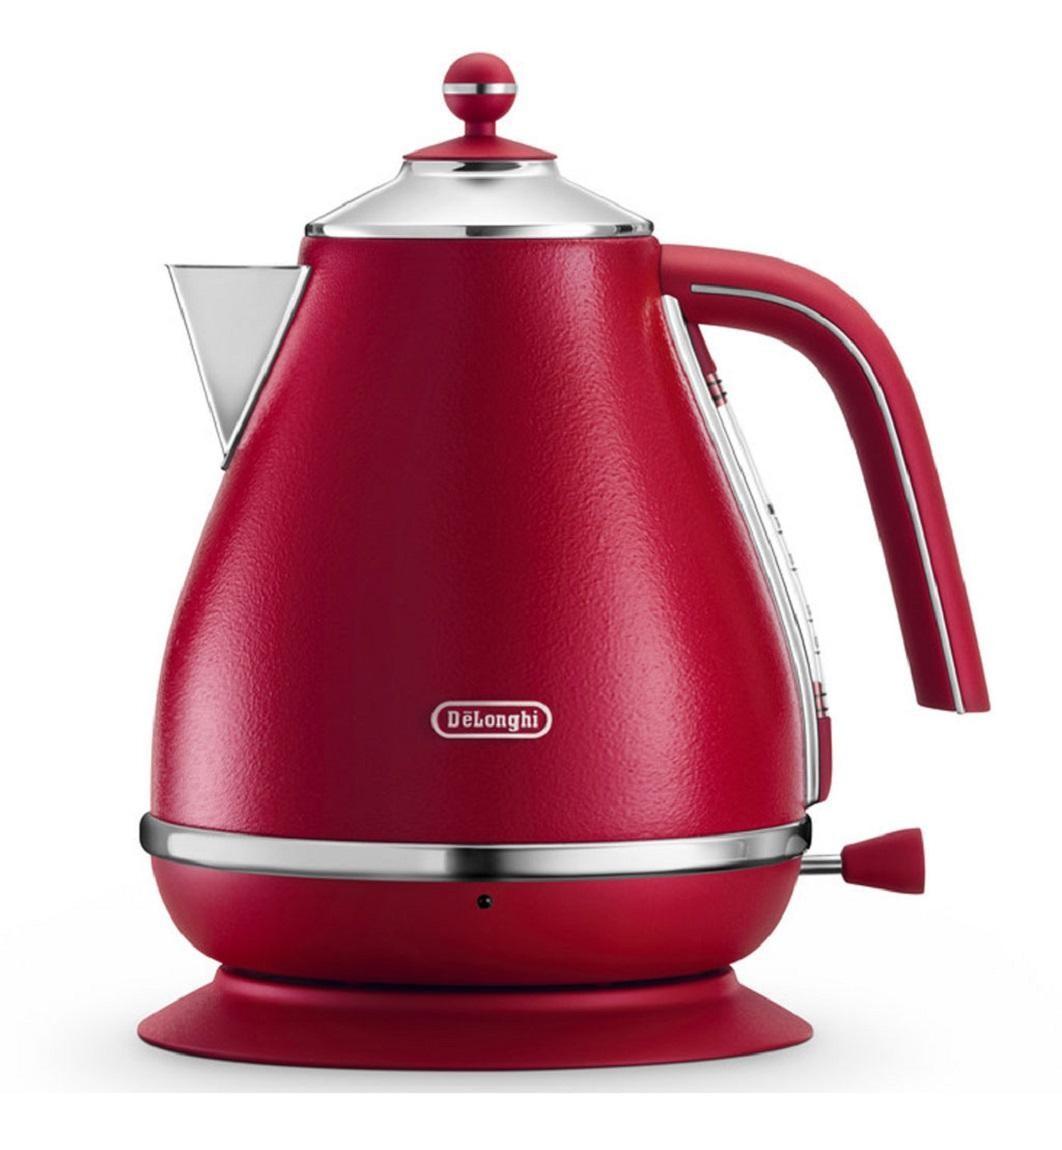 Delonghi-KBOE3001.R-kettle.jpg